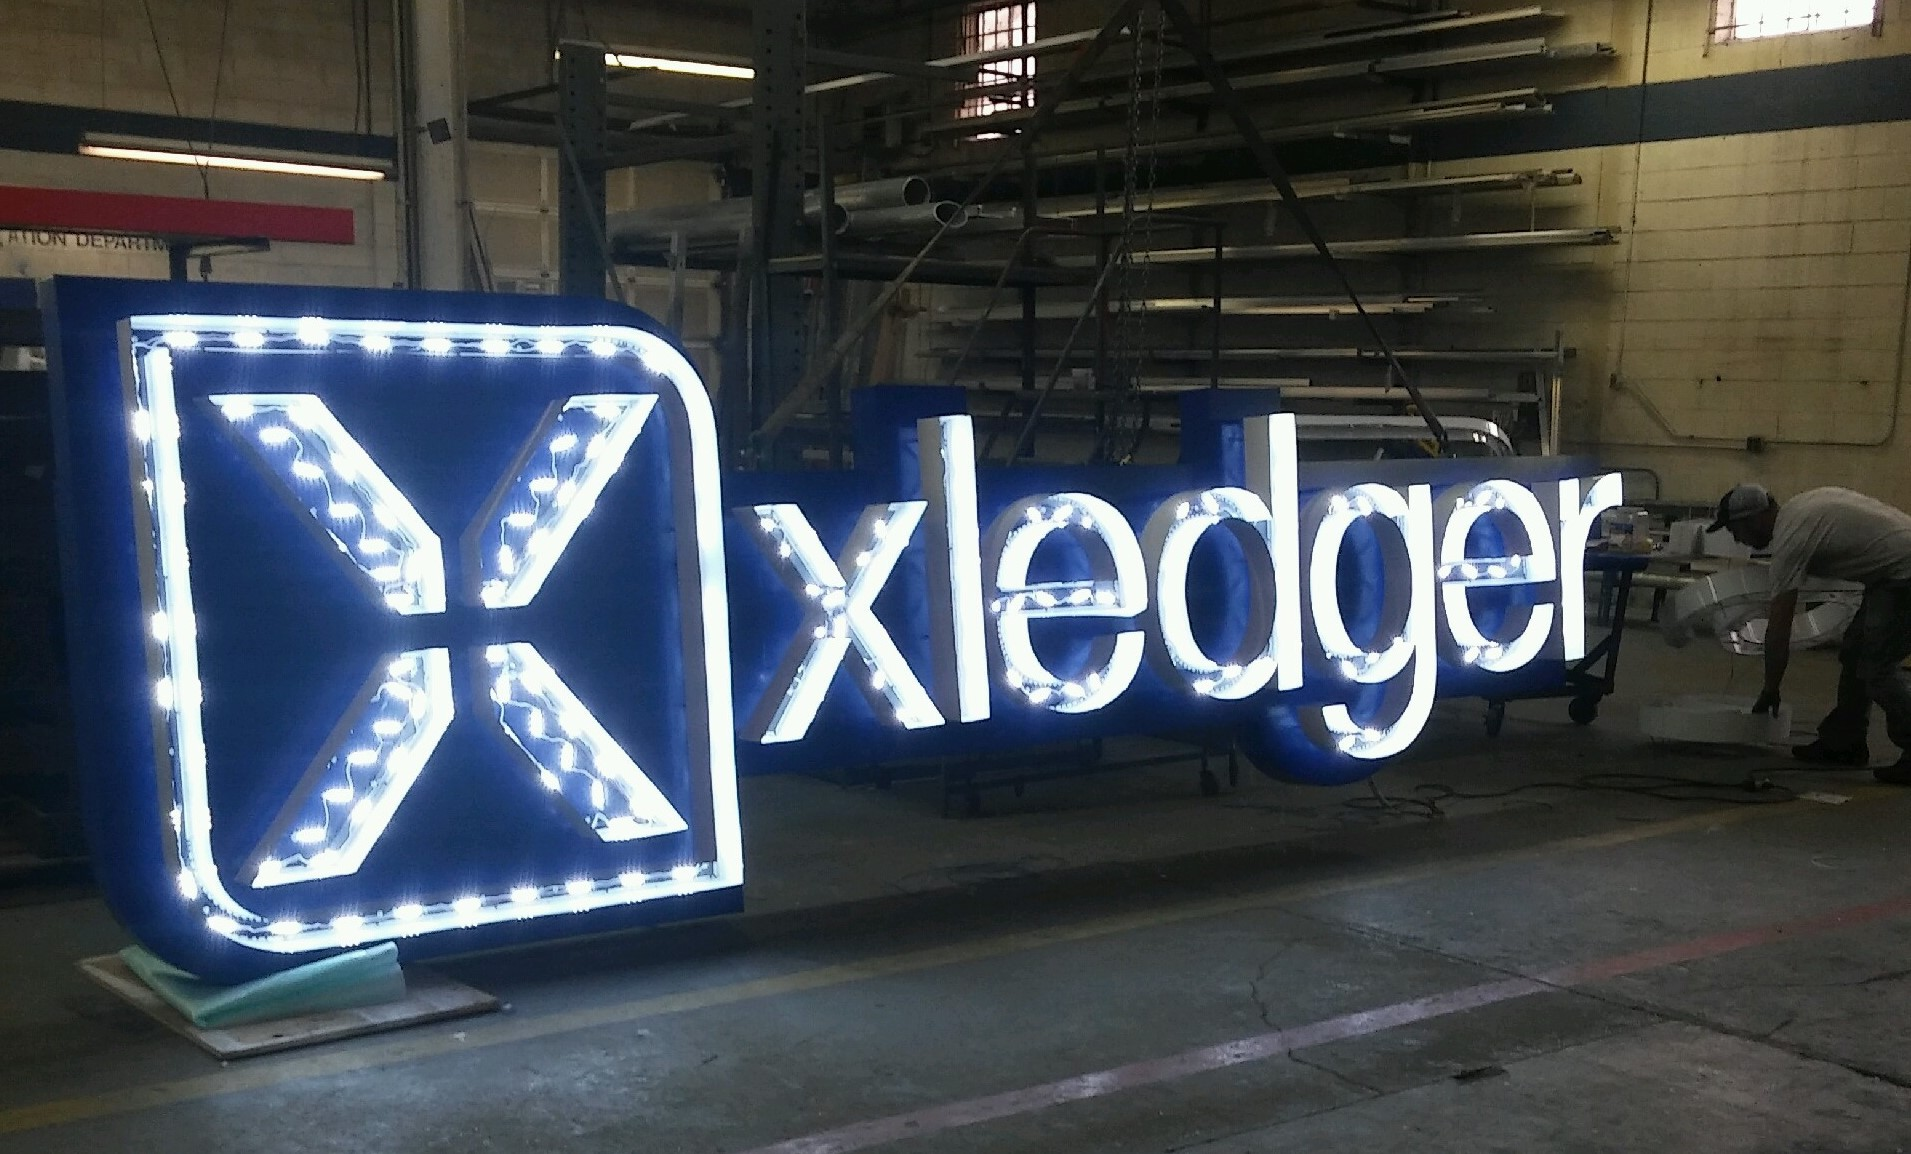 Xledger sign designed by Gordonsigns